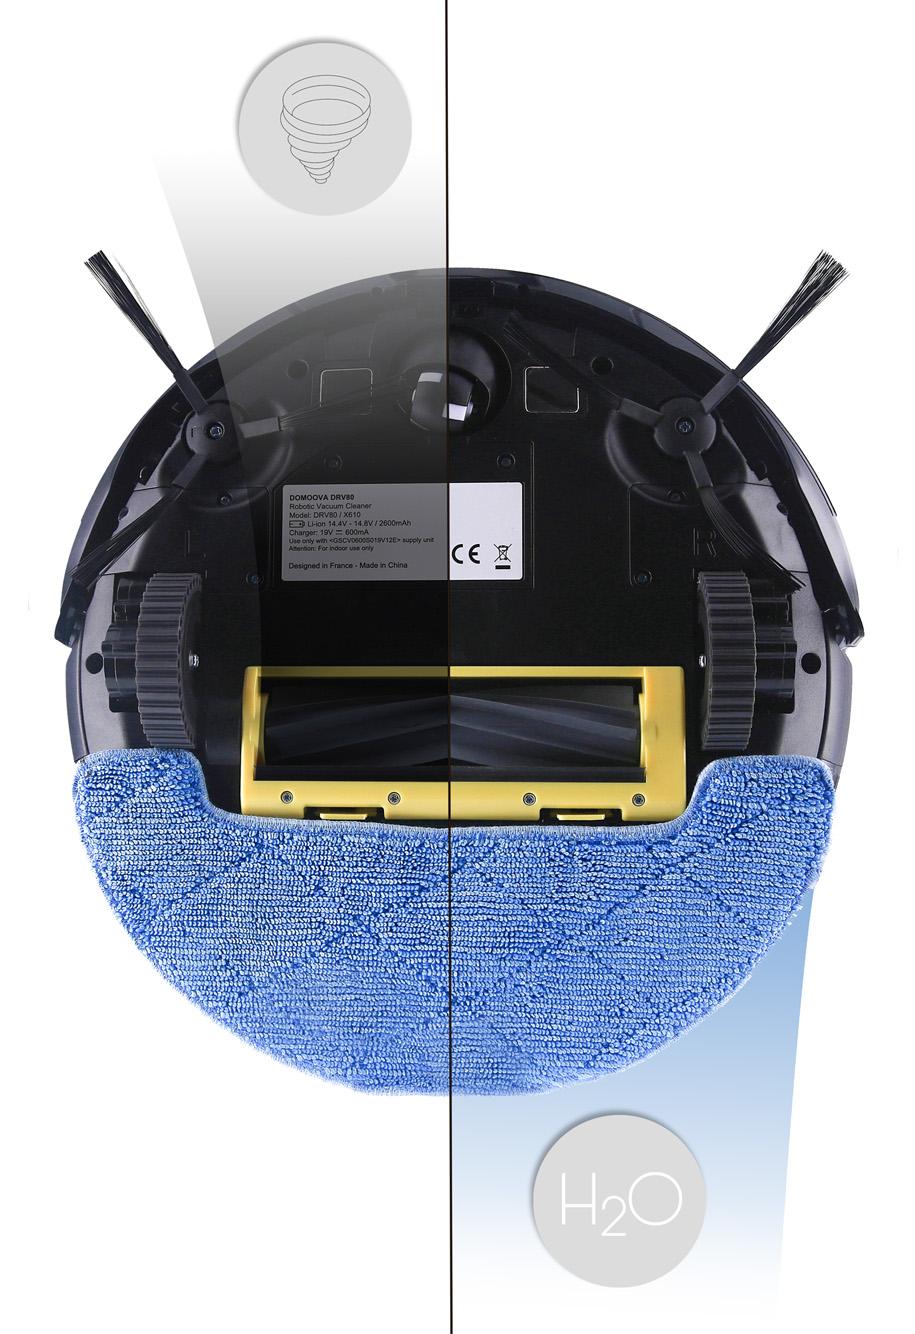 Robot aspirateur et laveur DOMOOVA DRV80 Animal BestofRobots